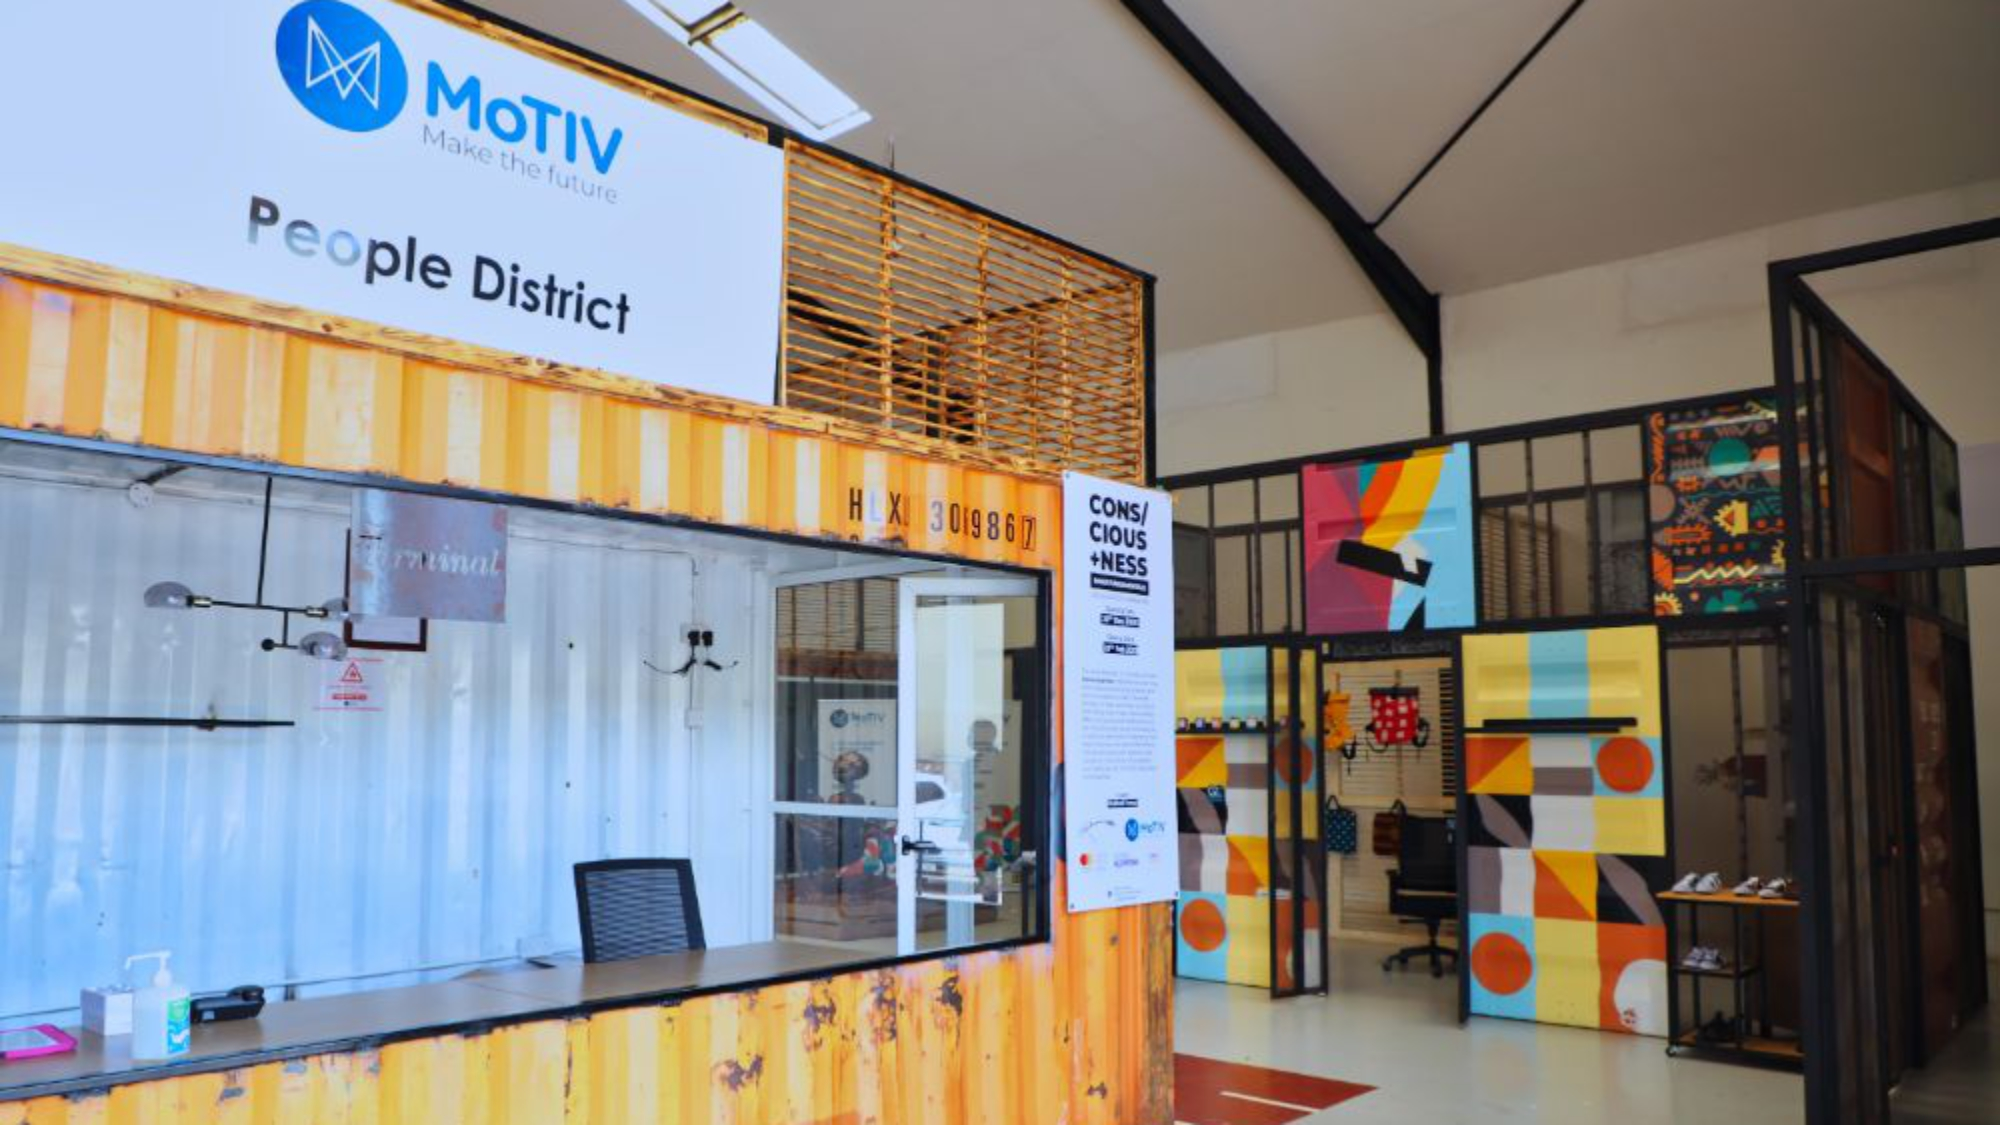 MoTIV-people-district (1)